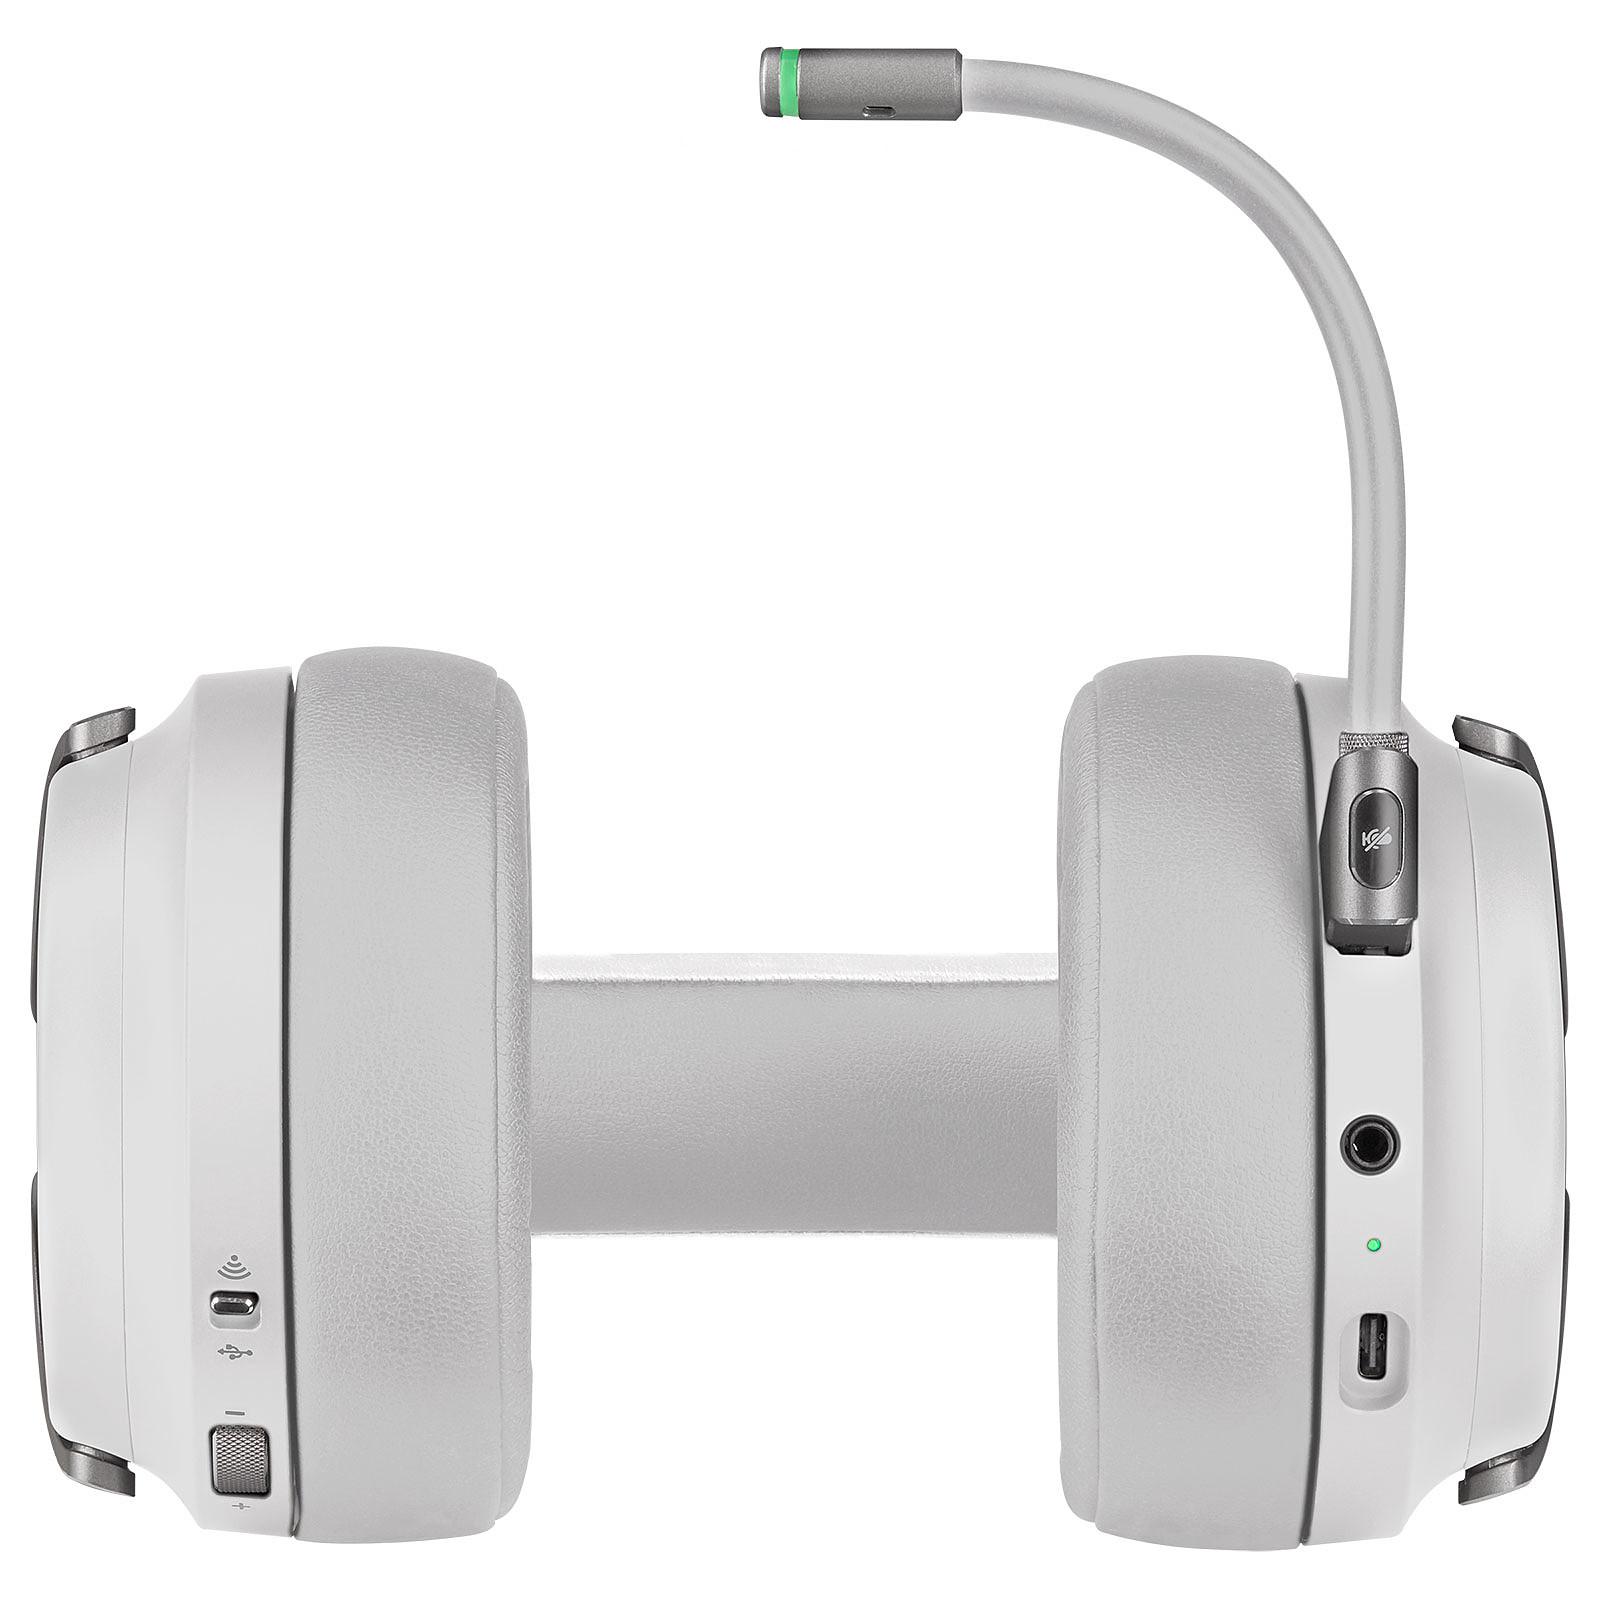 Auricular Corsair Virtuoso RGB Wireless Surround HiFi White